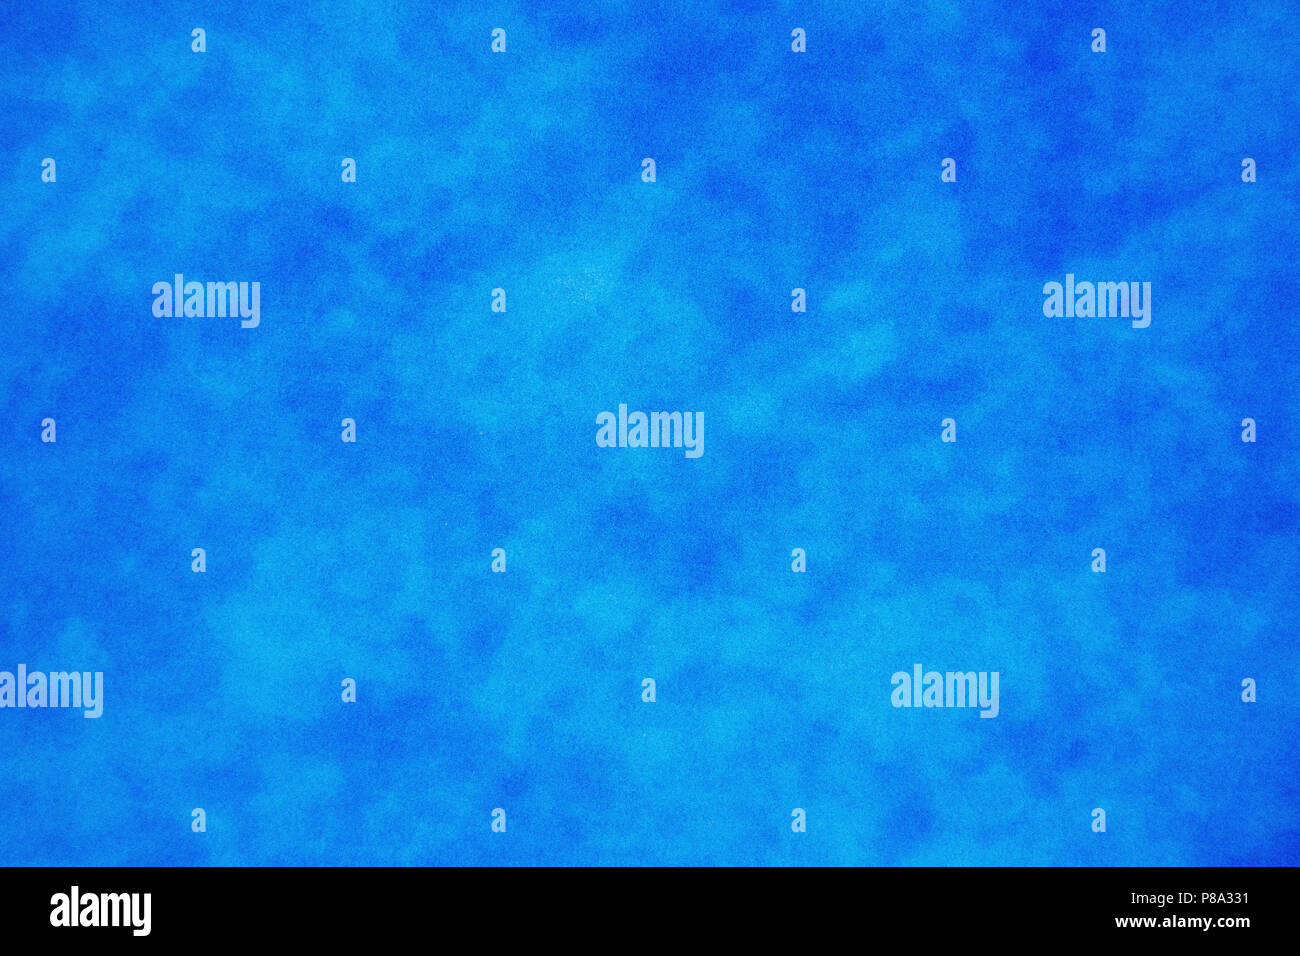 Mottled Effect Stock Photos & Mottled Effect Stock Images - Alamy